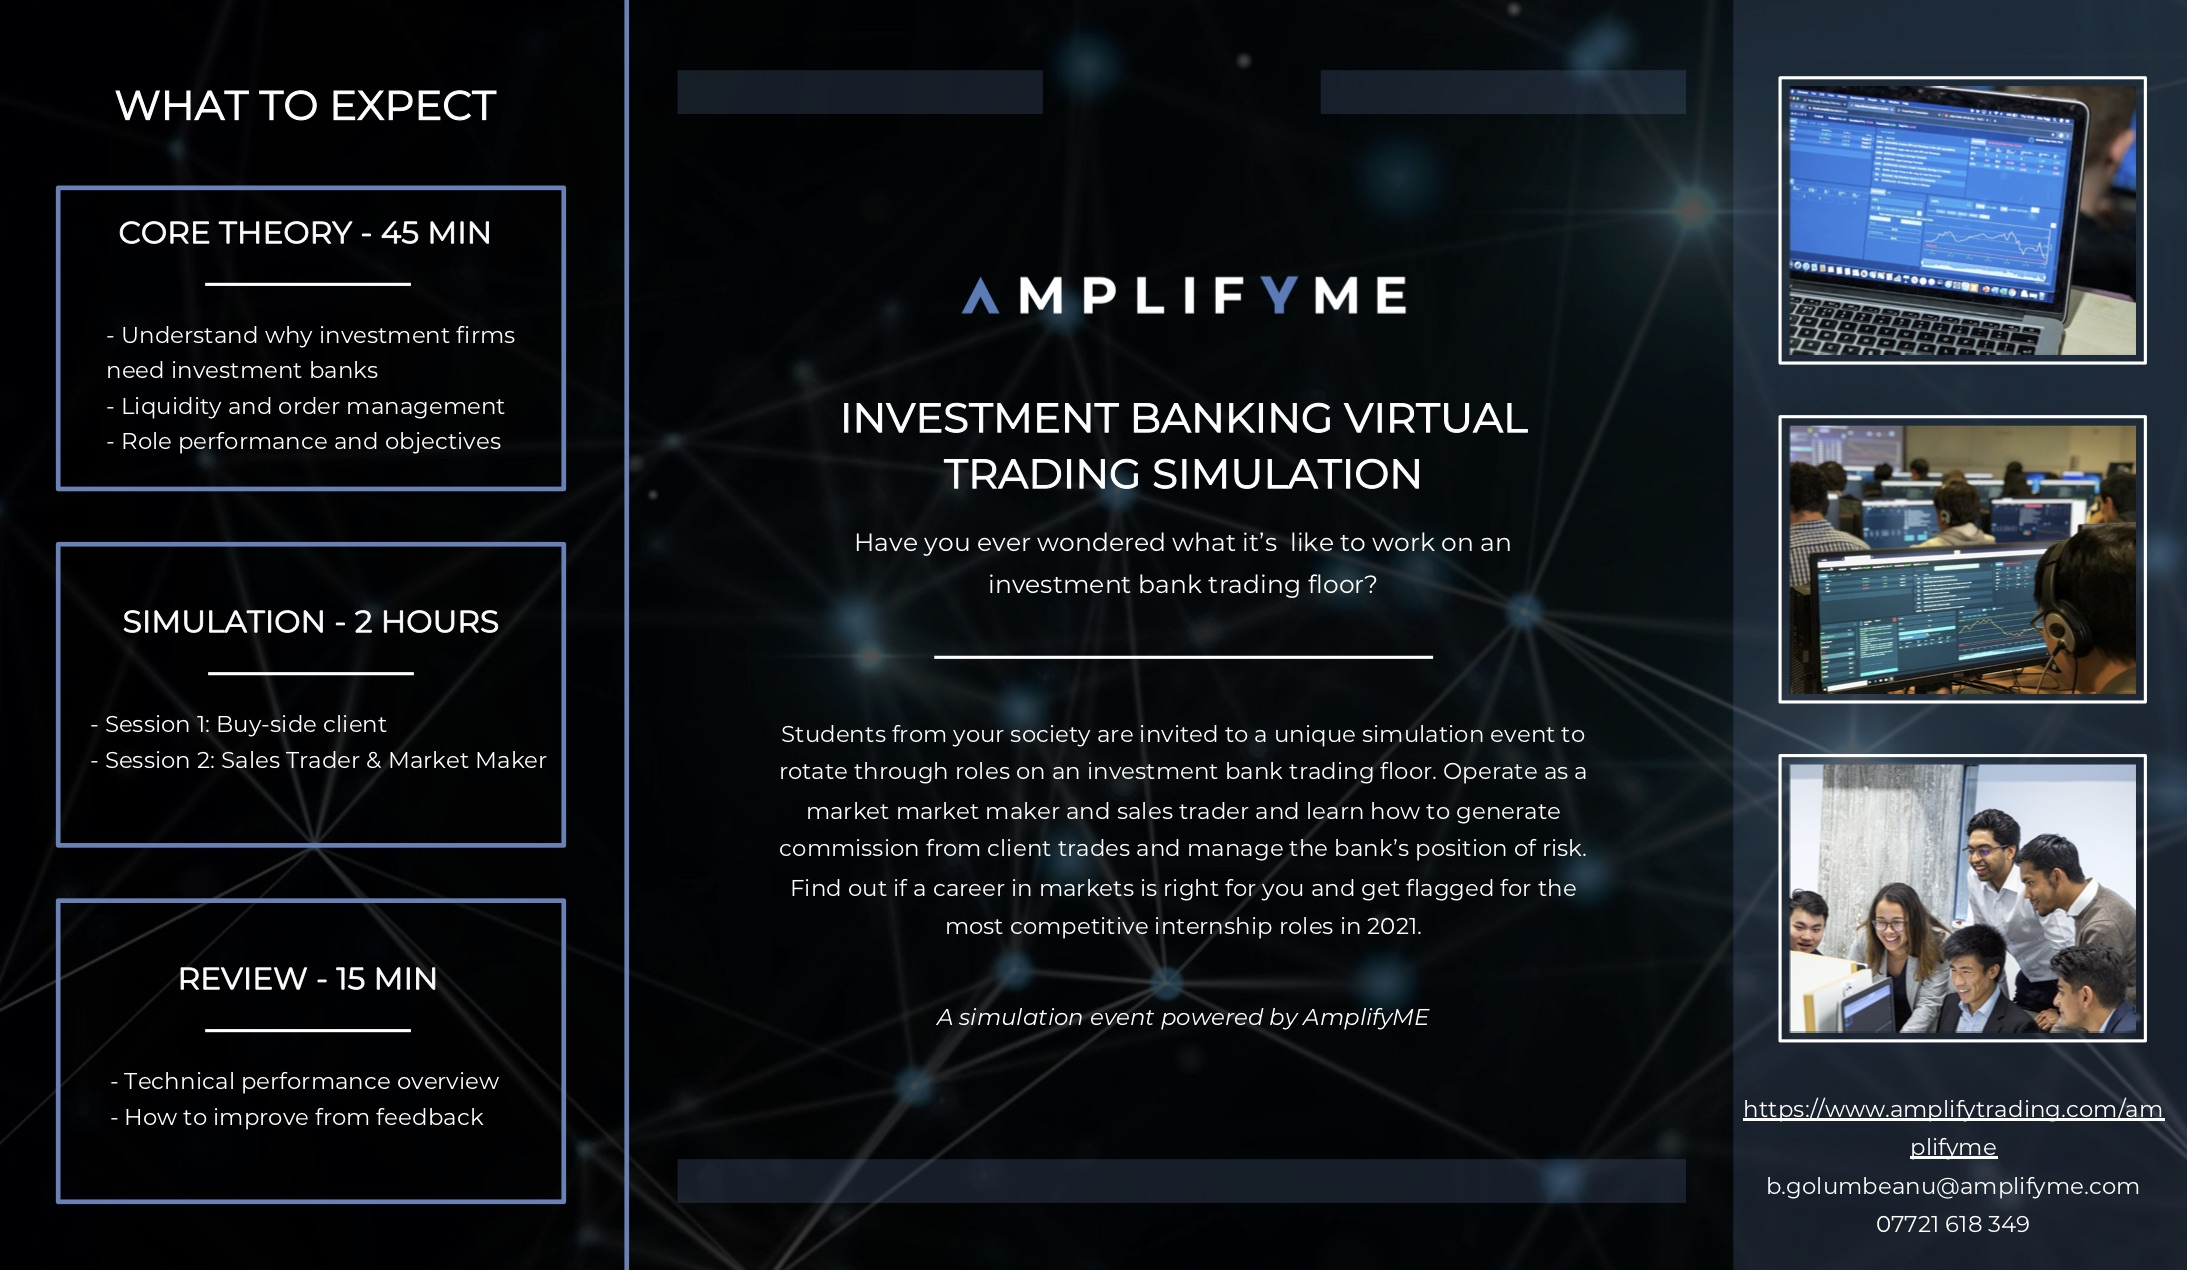 Amplify Trading Simulation